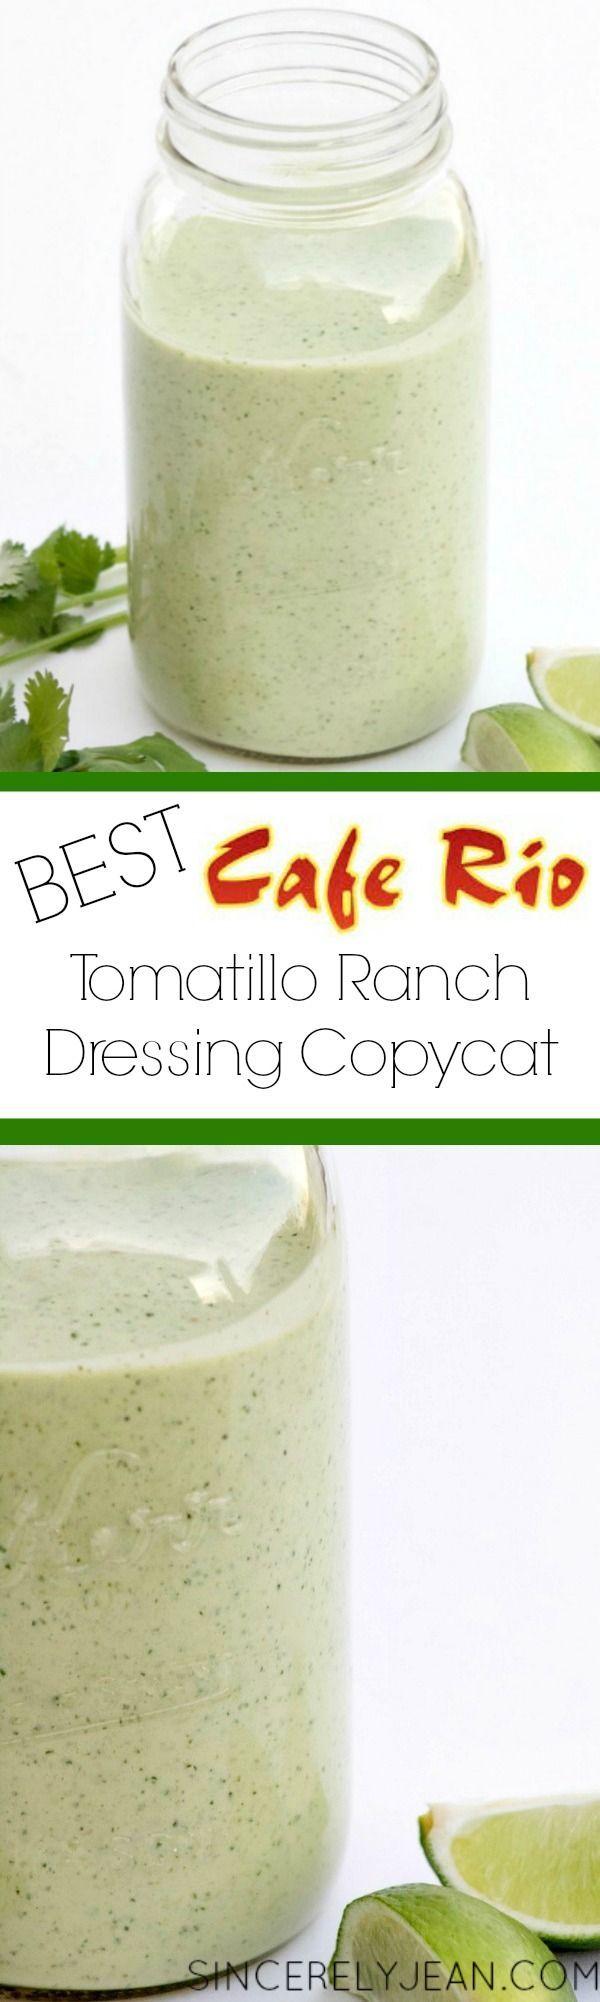 The Best Tomatillo Ranch Dressing Cafe Rio Copycat | http://www.sincerelyjean.com